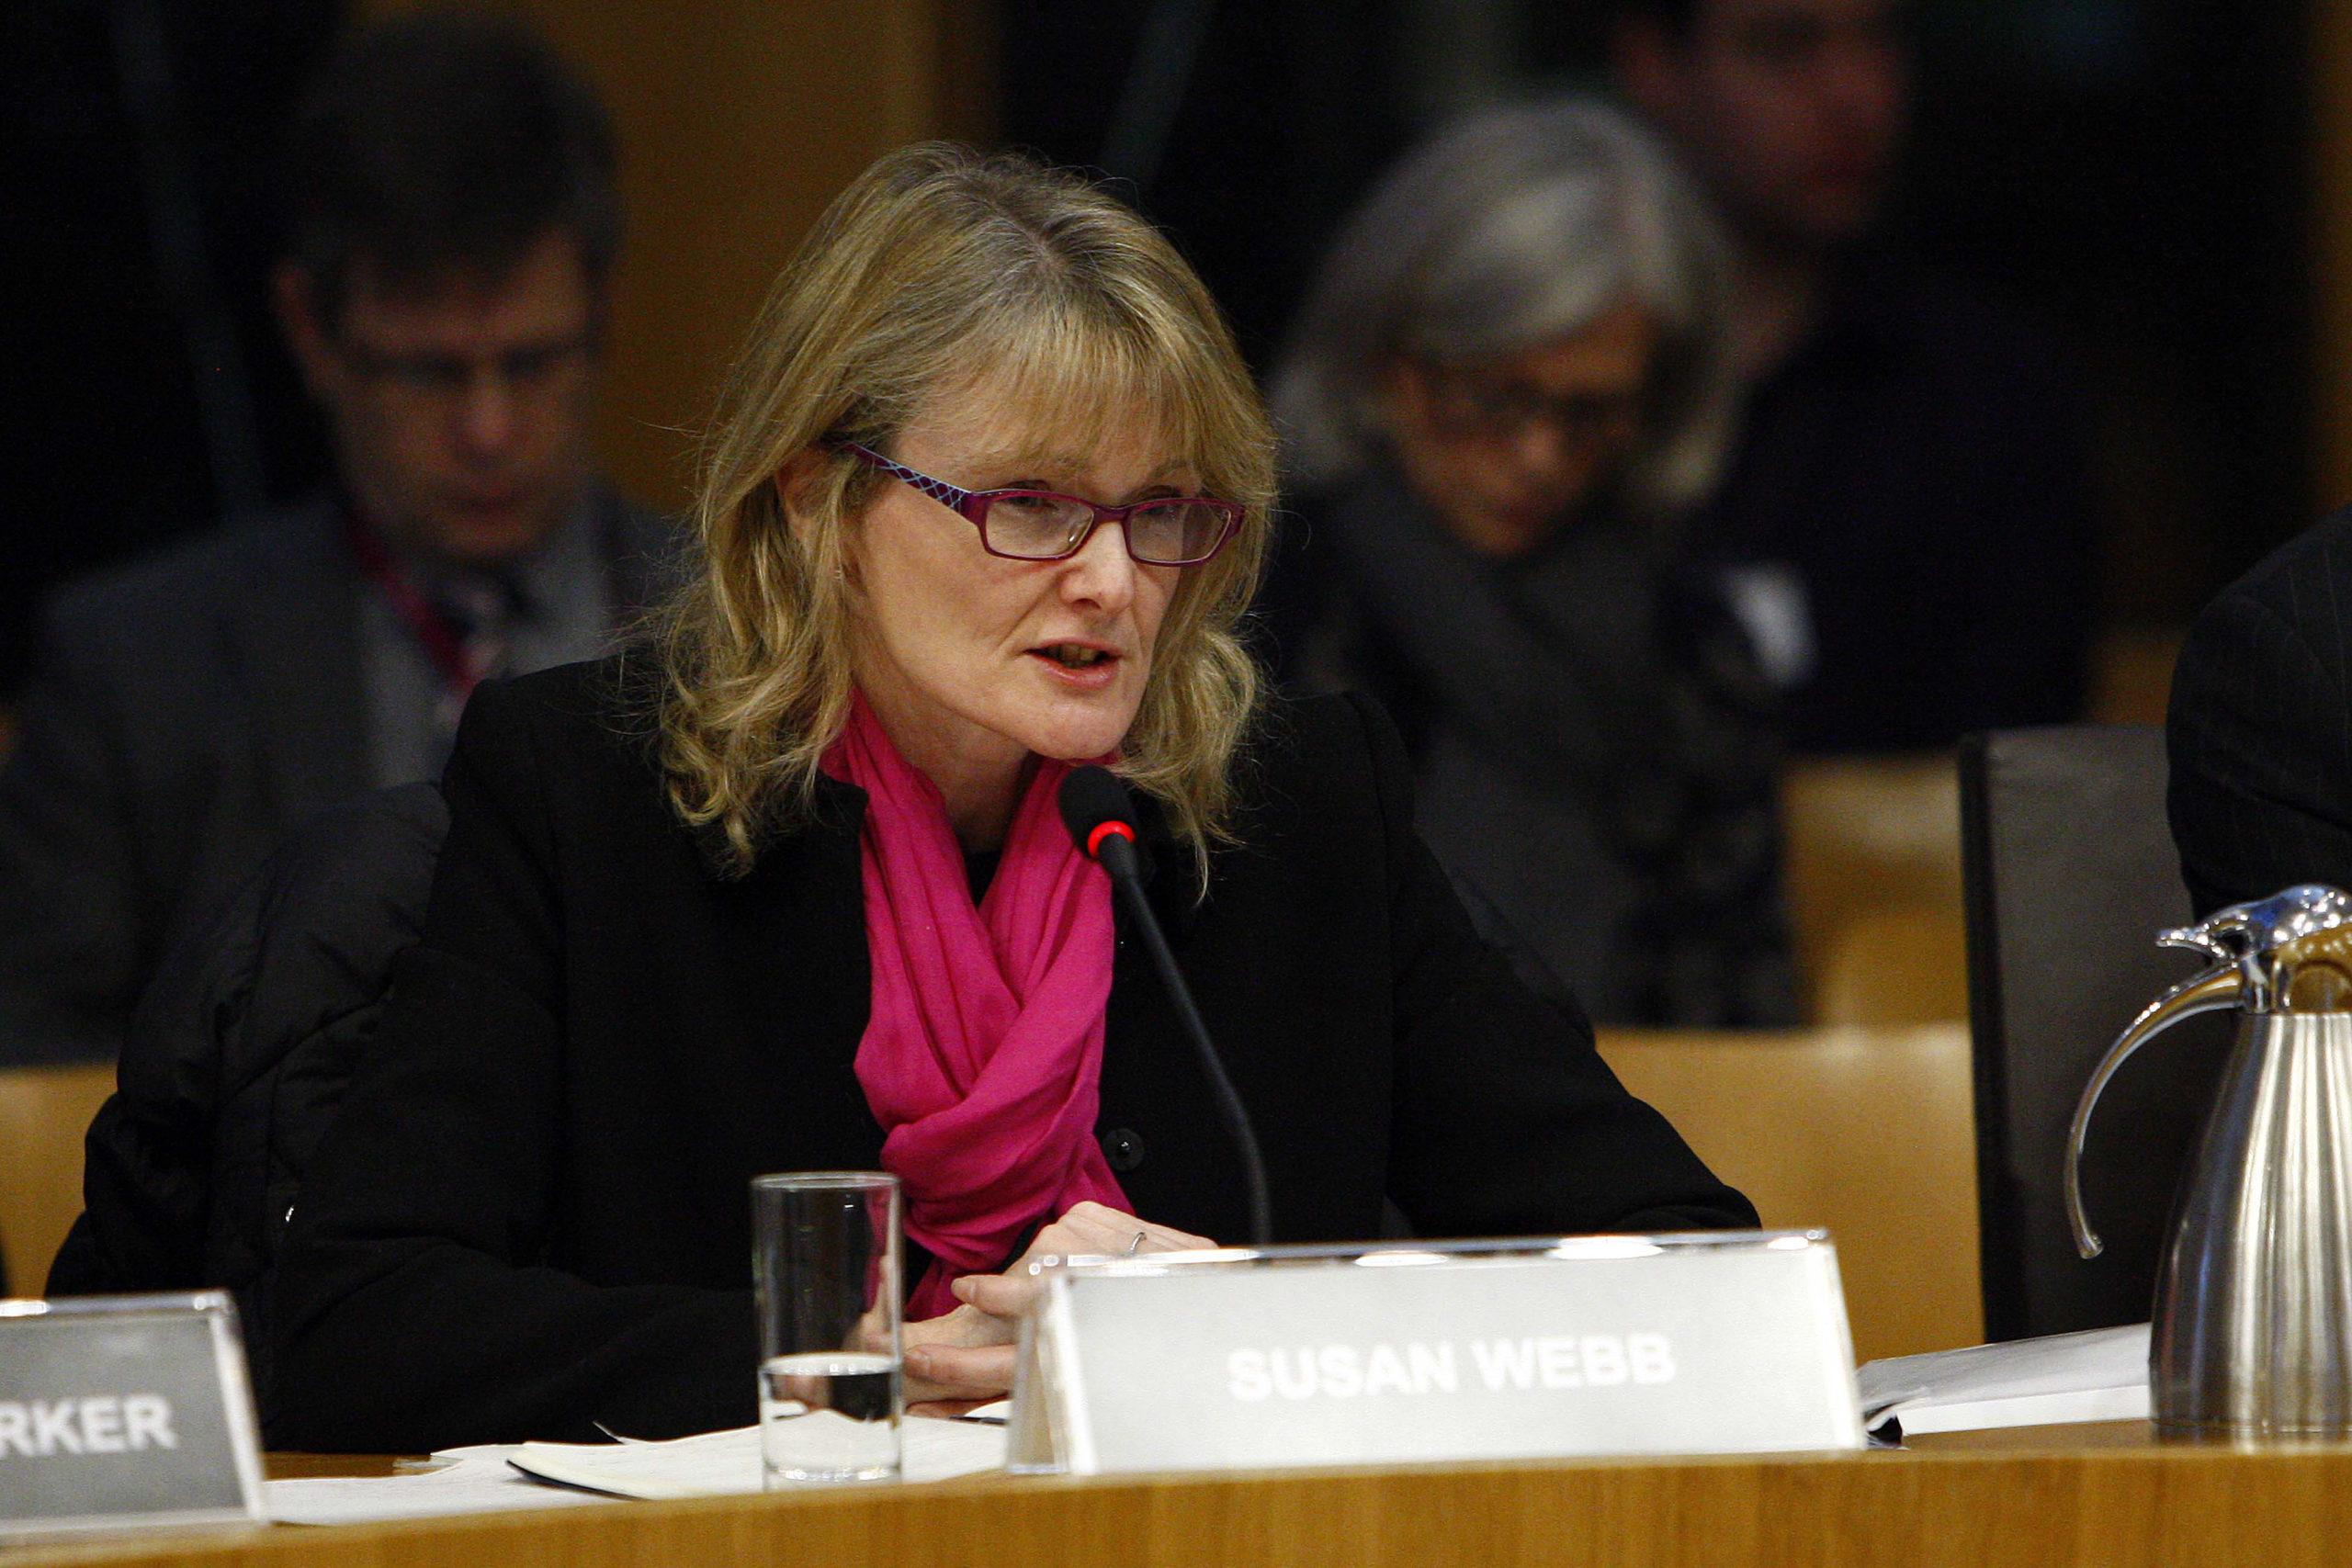 Susan Webb, Director of Public Health, NHS Grampian